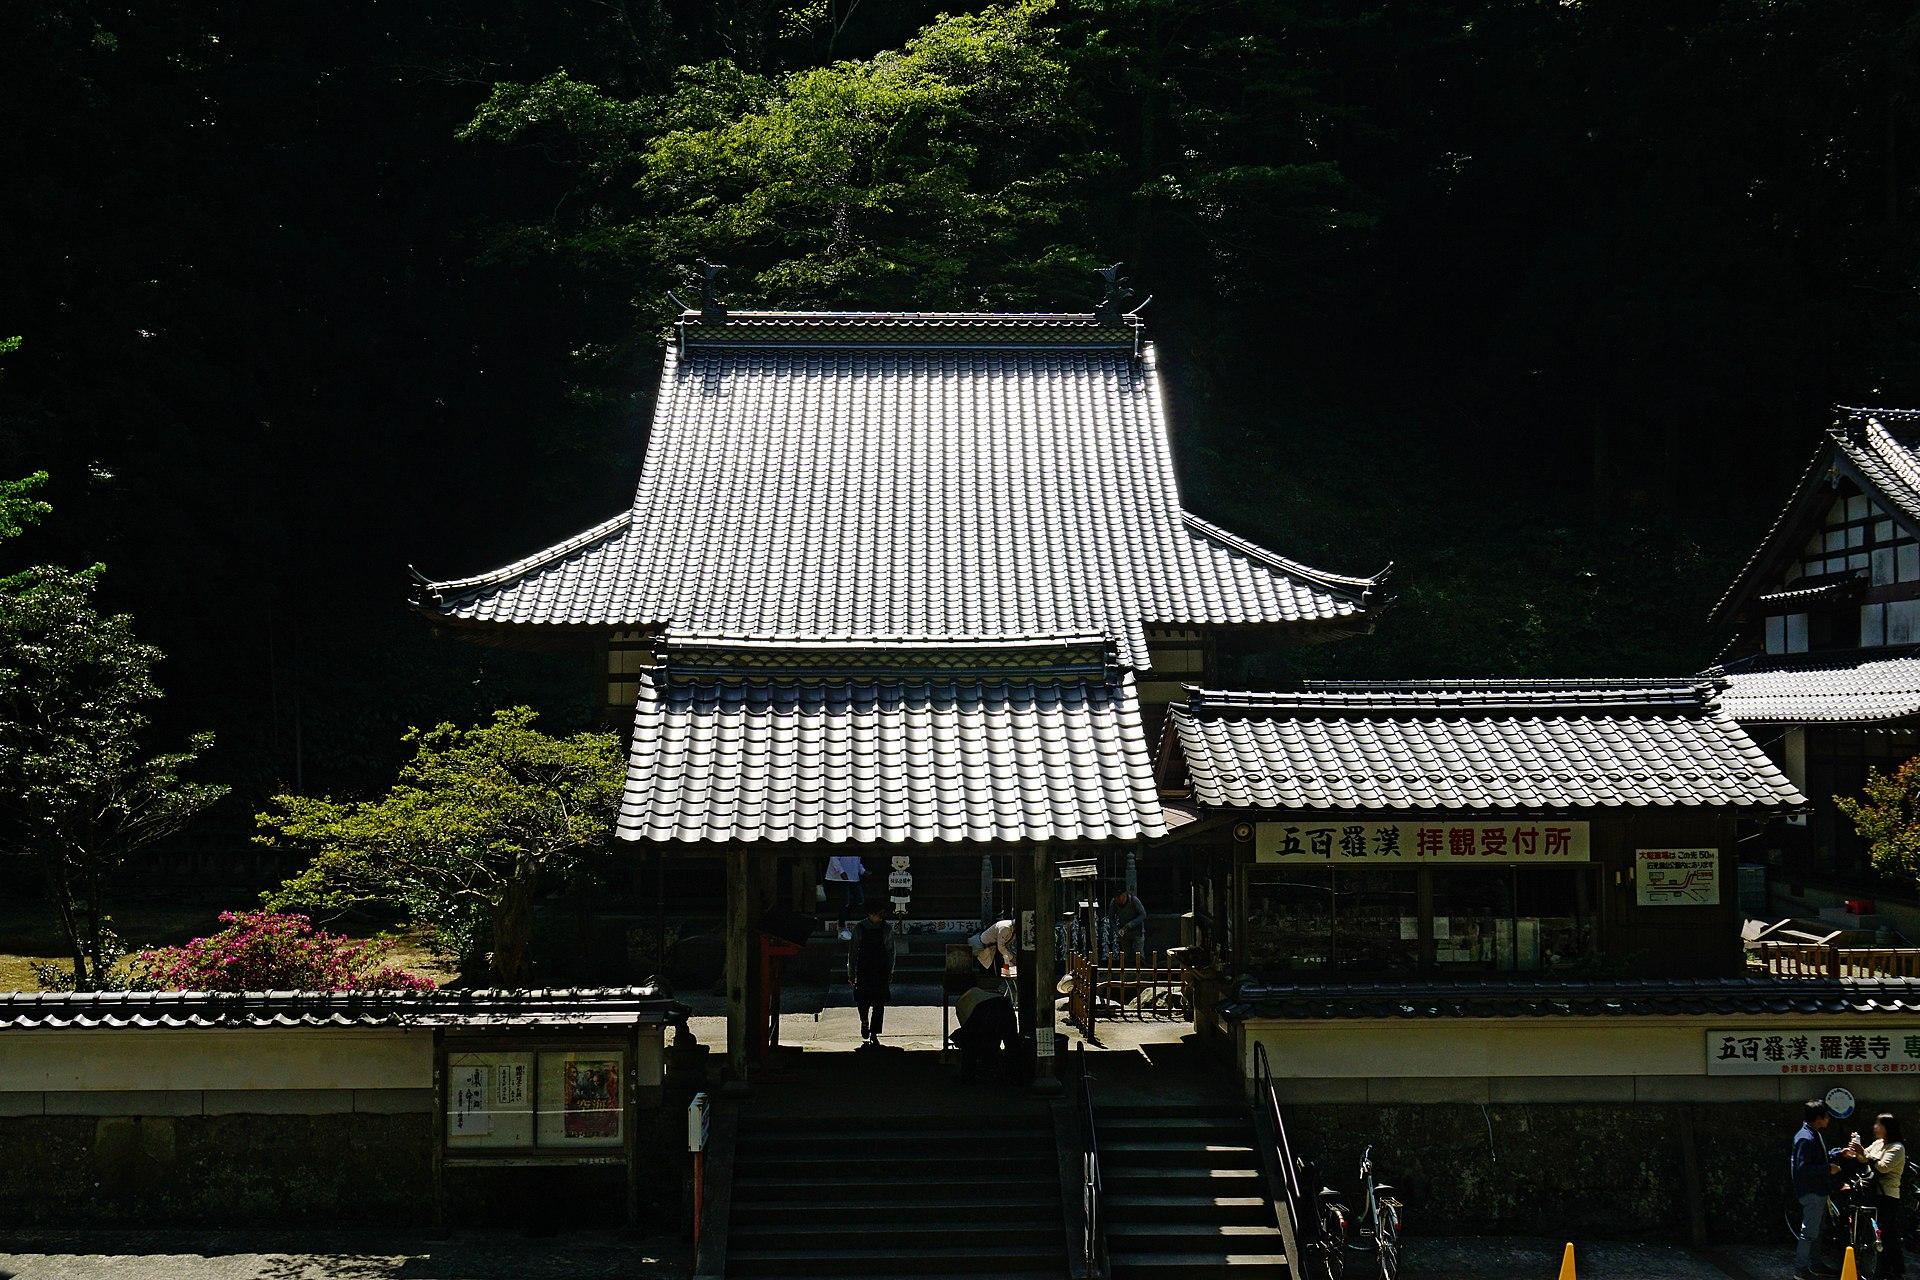 180504 Rakan-ji of Iwami Ginzan Silver Mine Oda Shimane pref Japan06s5.jpg